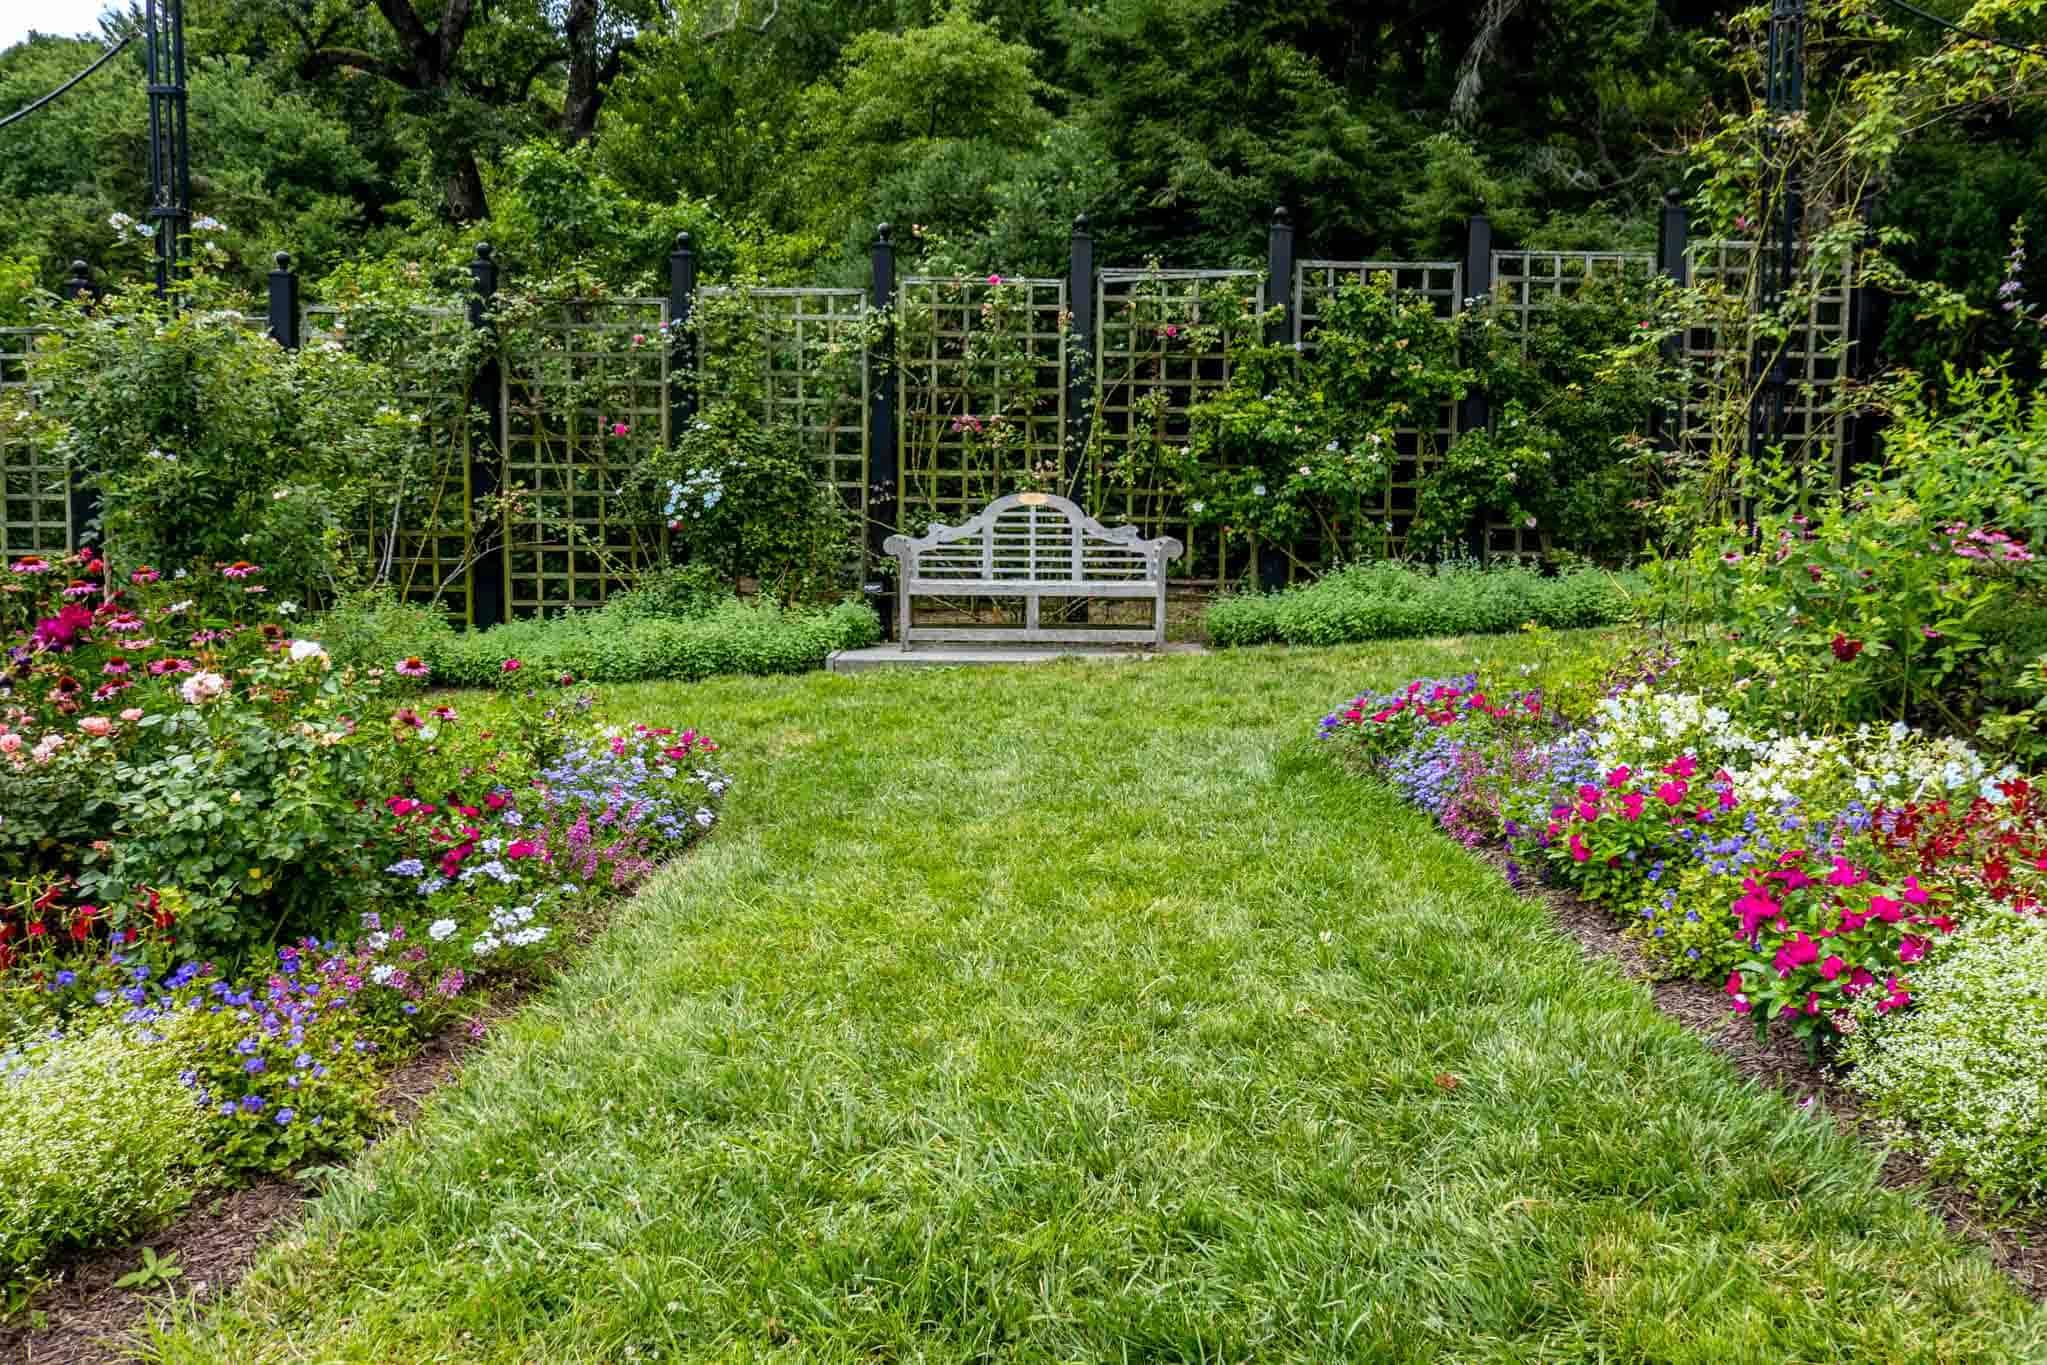 Wooden bench in a rose garden